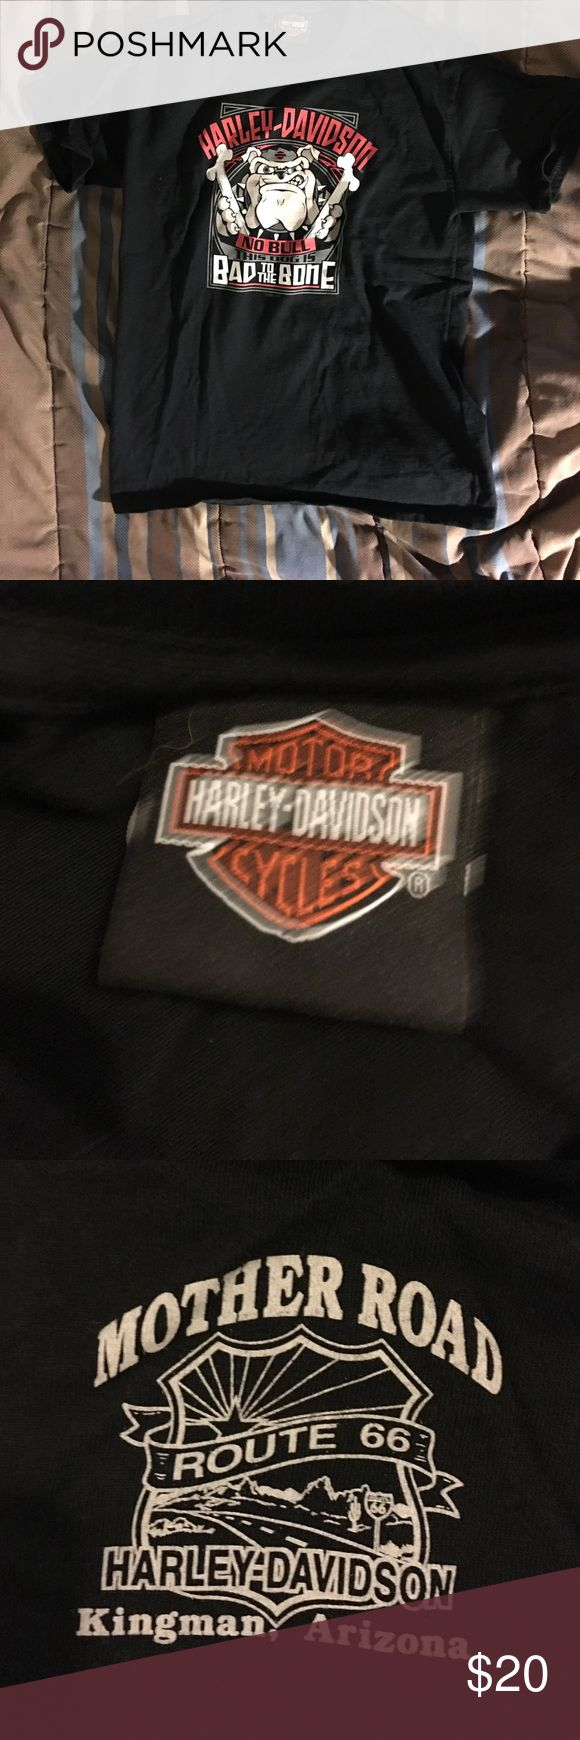 Boys Harley Davidson t shirt Mother road route 66 Shirts & Tops Tees - Short Sleeve